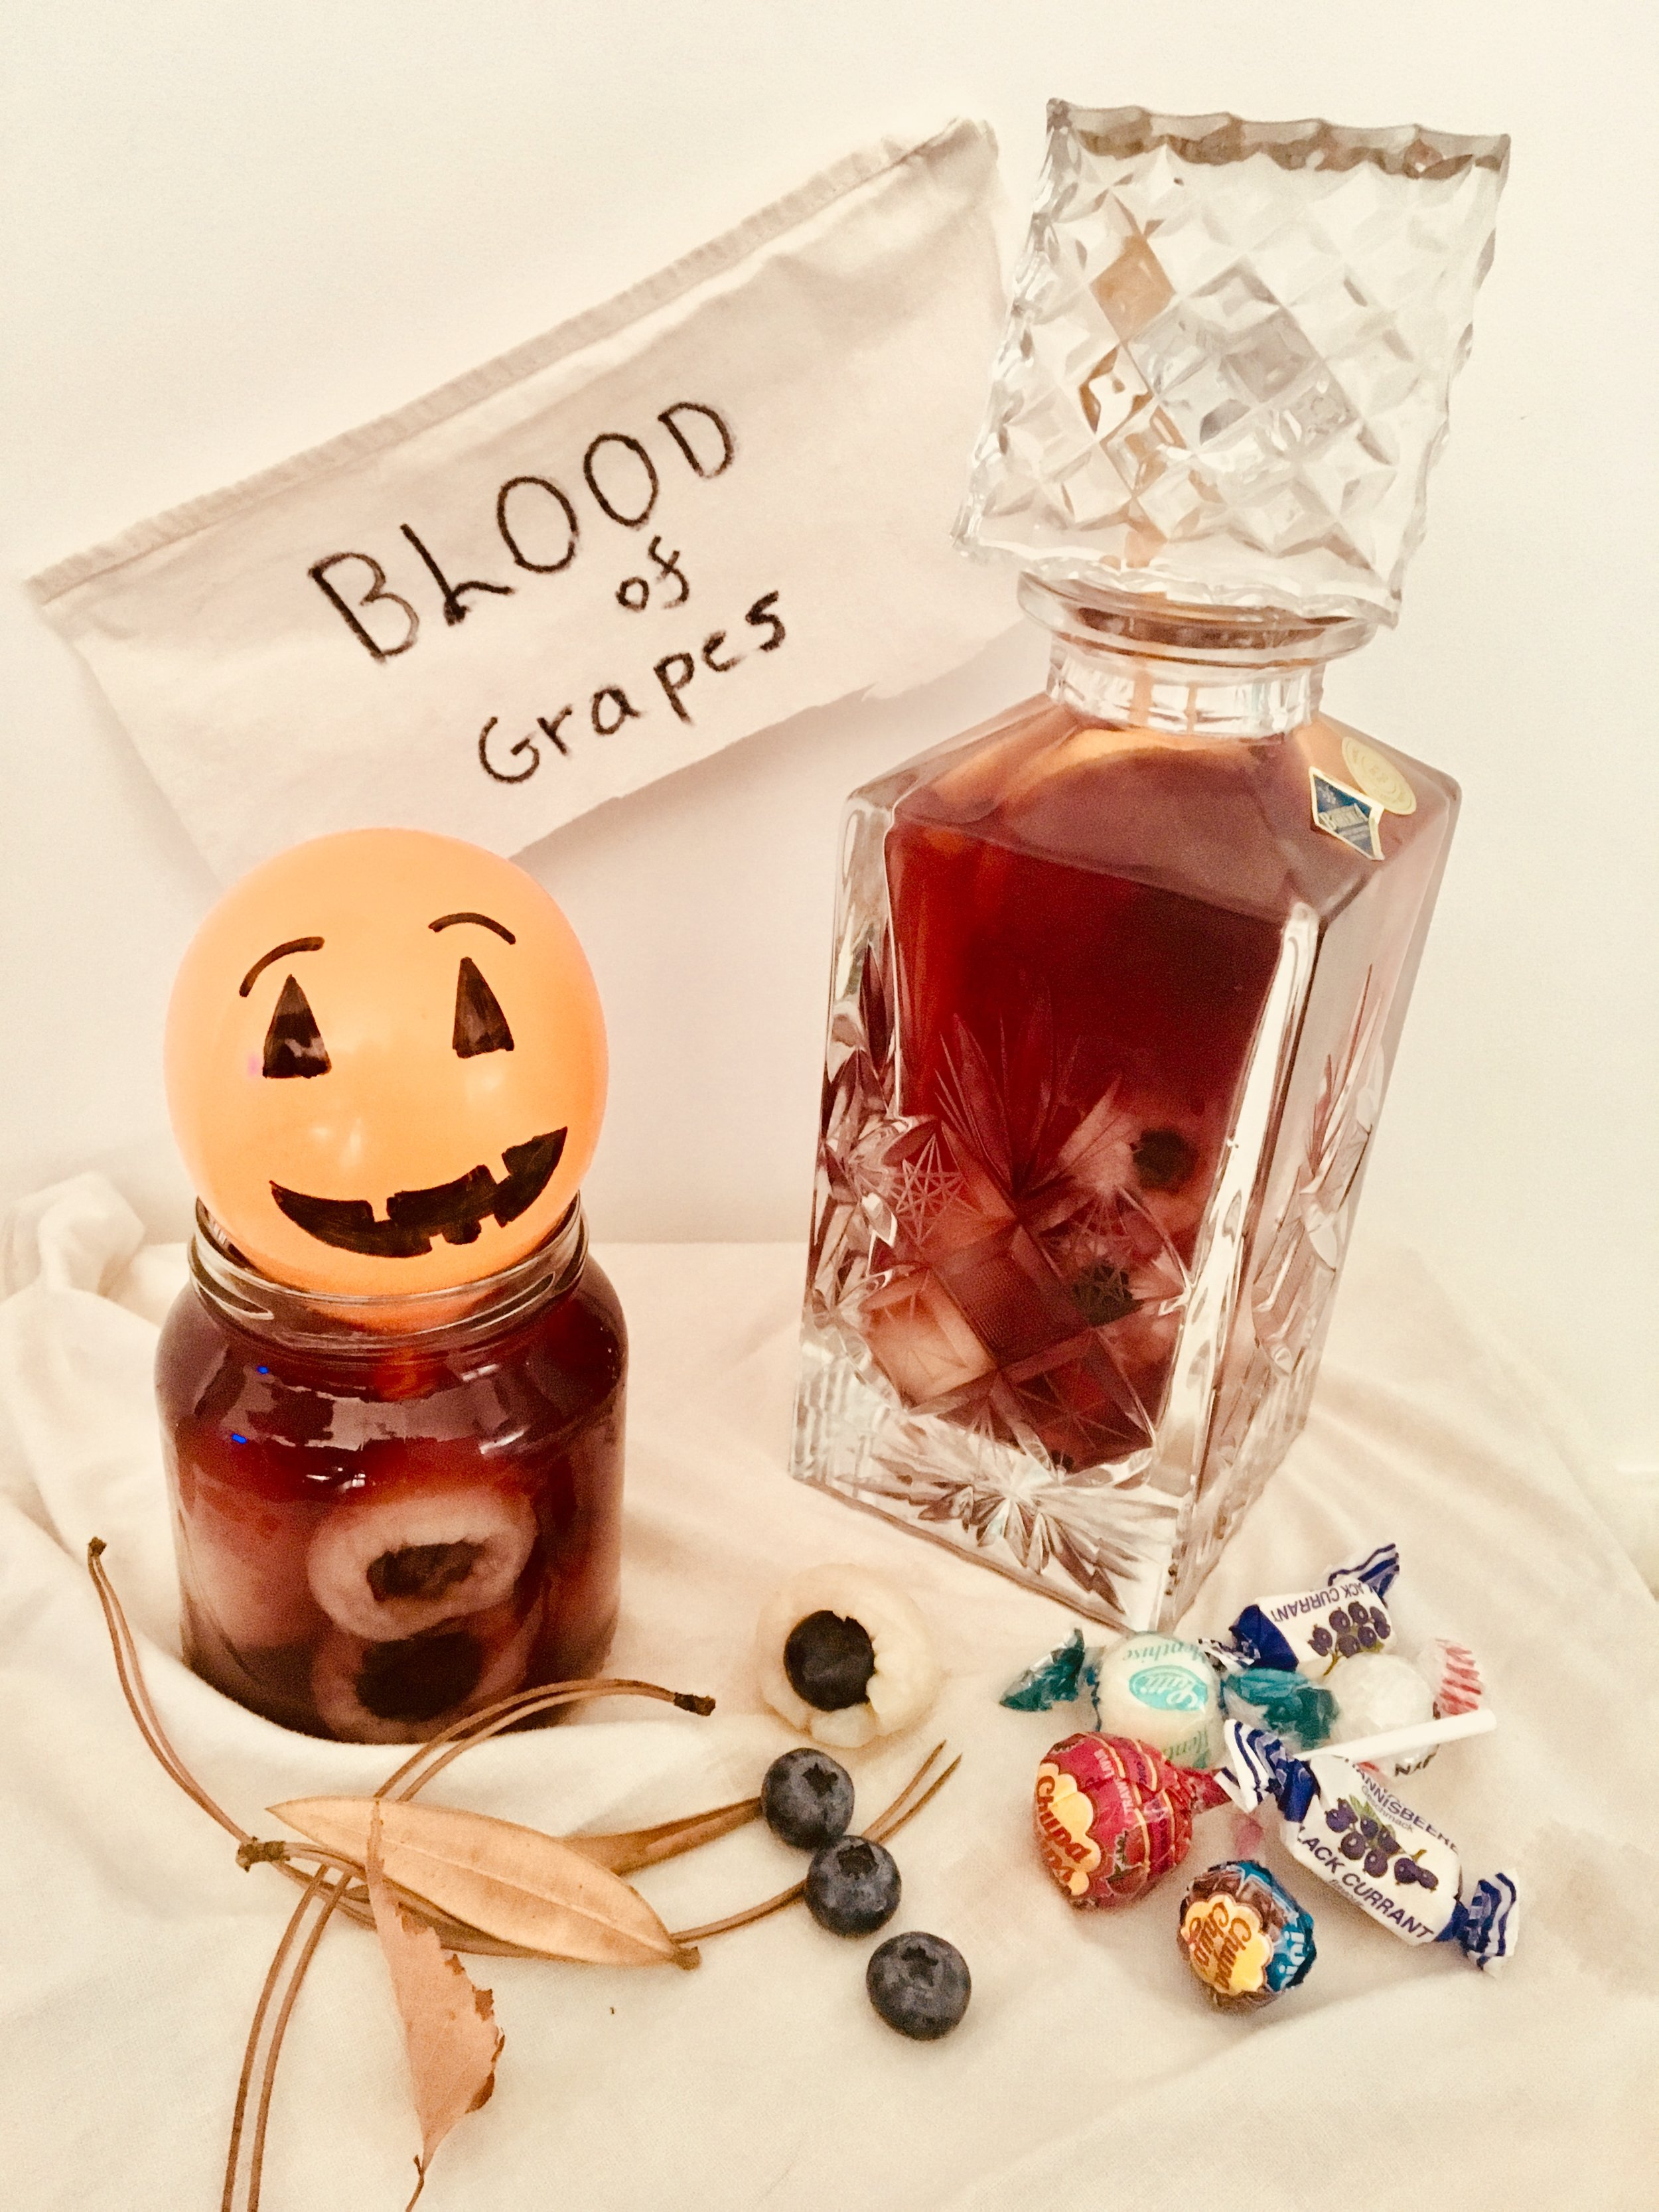 Sangriacula